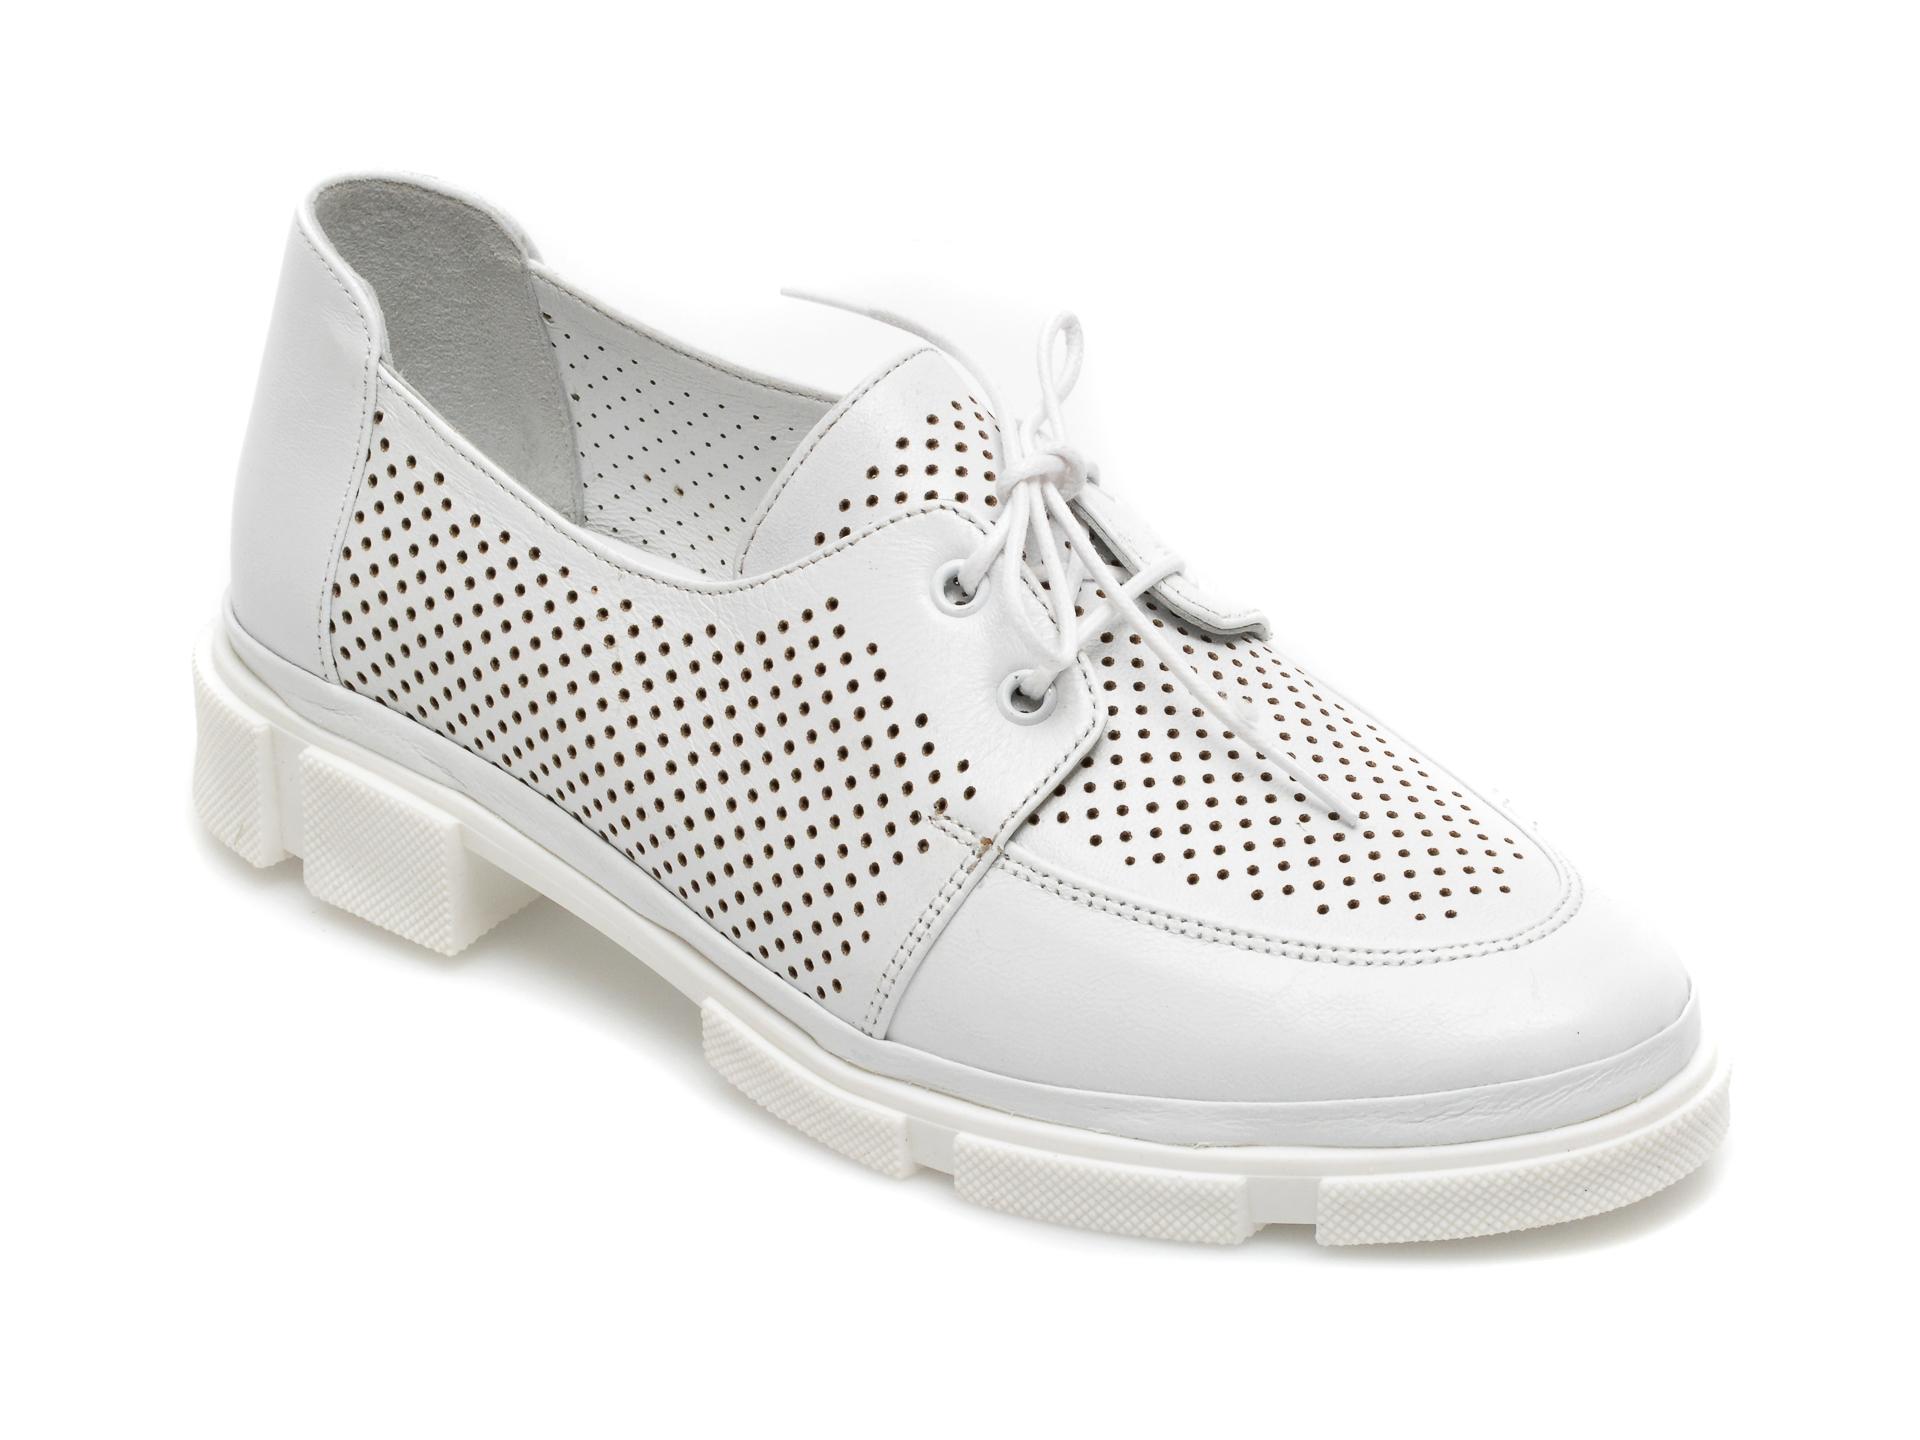 Pantofi MOLLY BESSA albi, MN107, din piele naturala